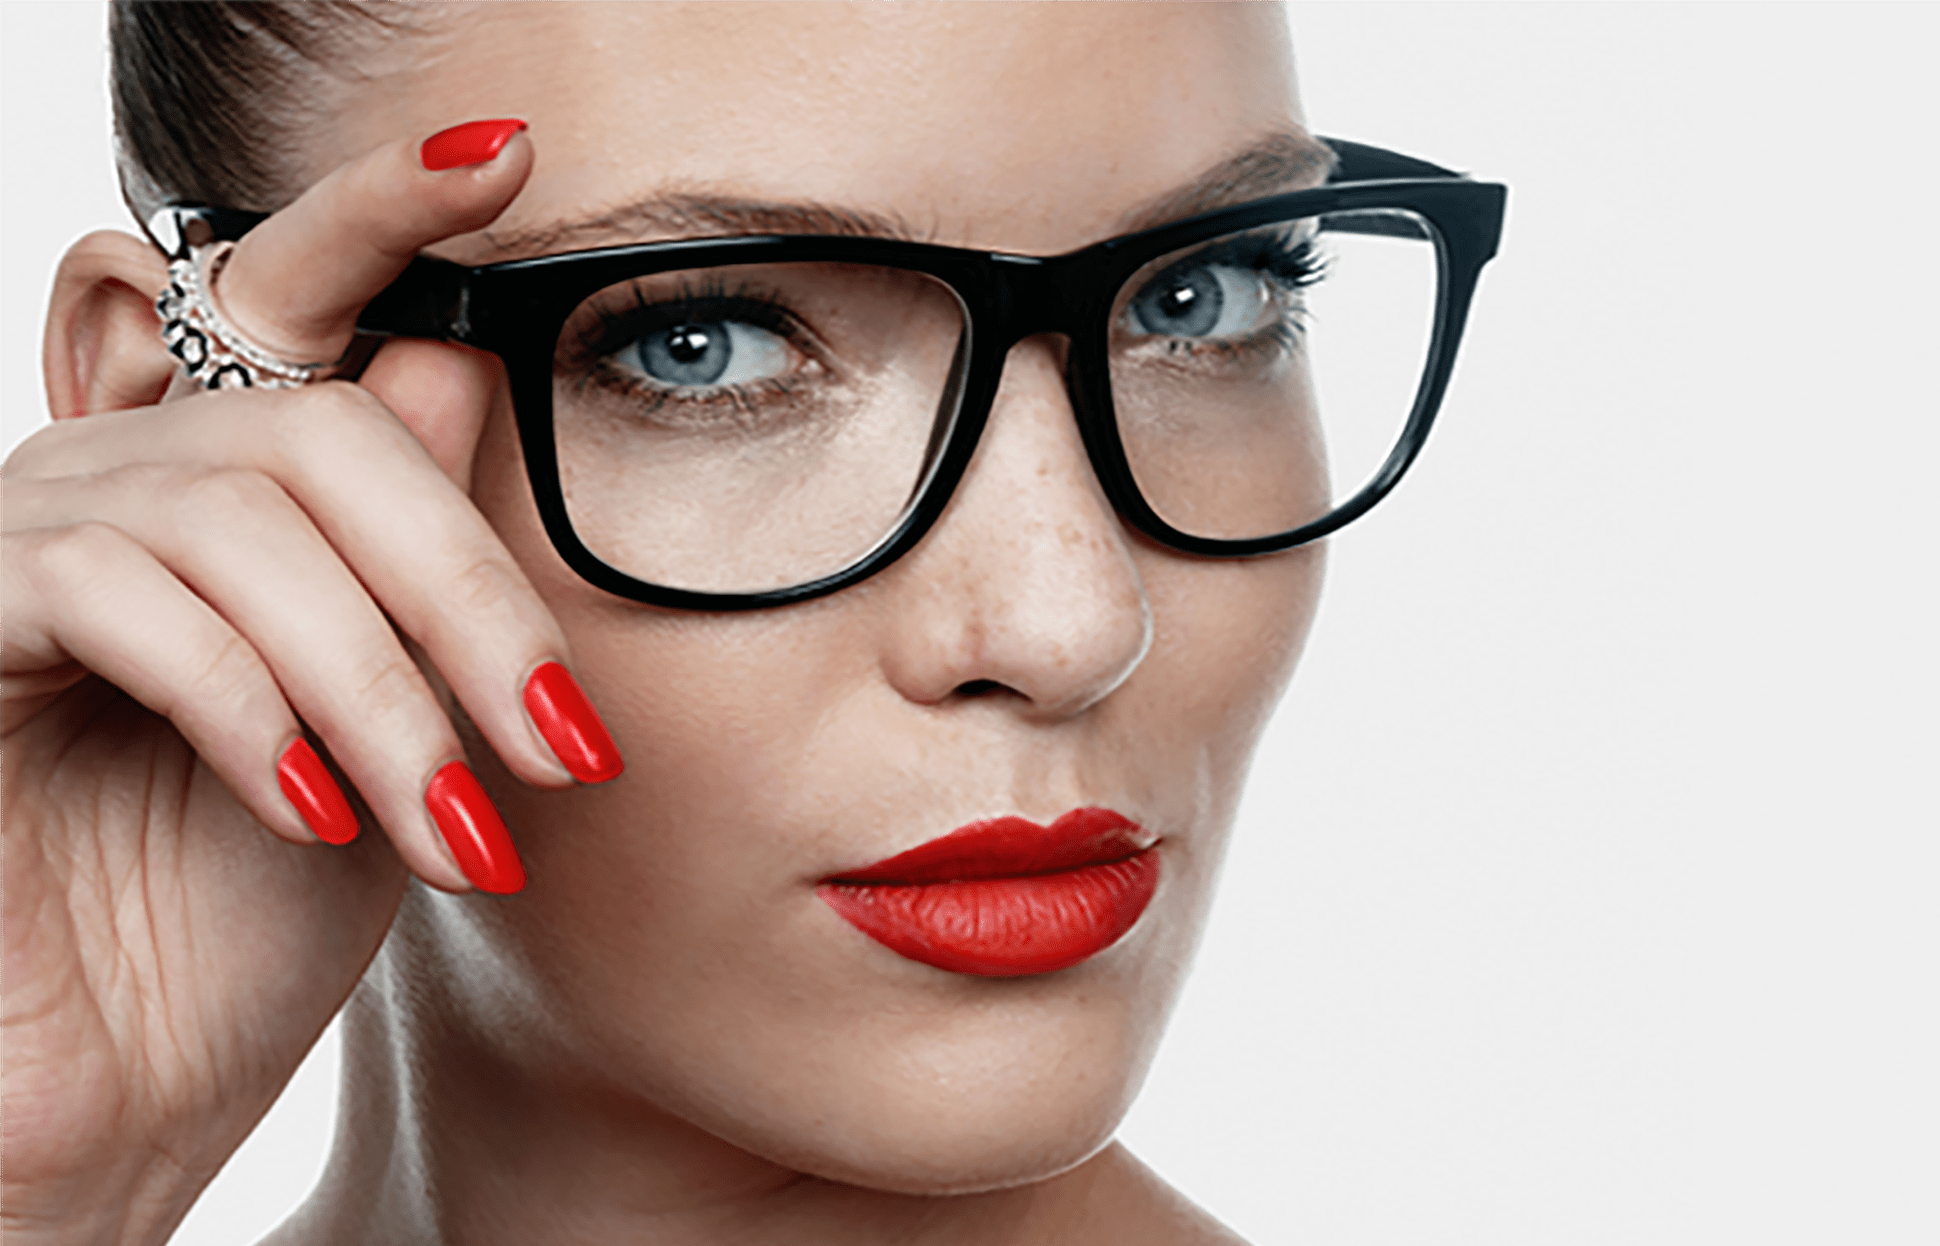 schminken mit brille so geht s brillenstyling. Black Bedroom Furniture Sets. Home Design Ideas